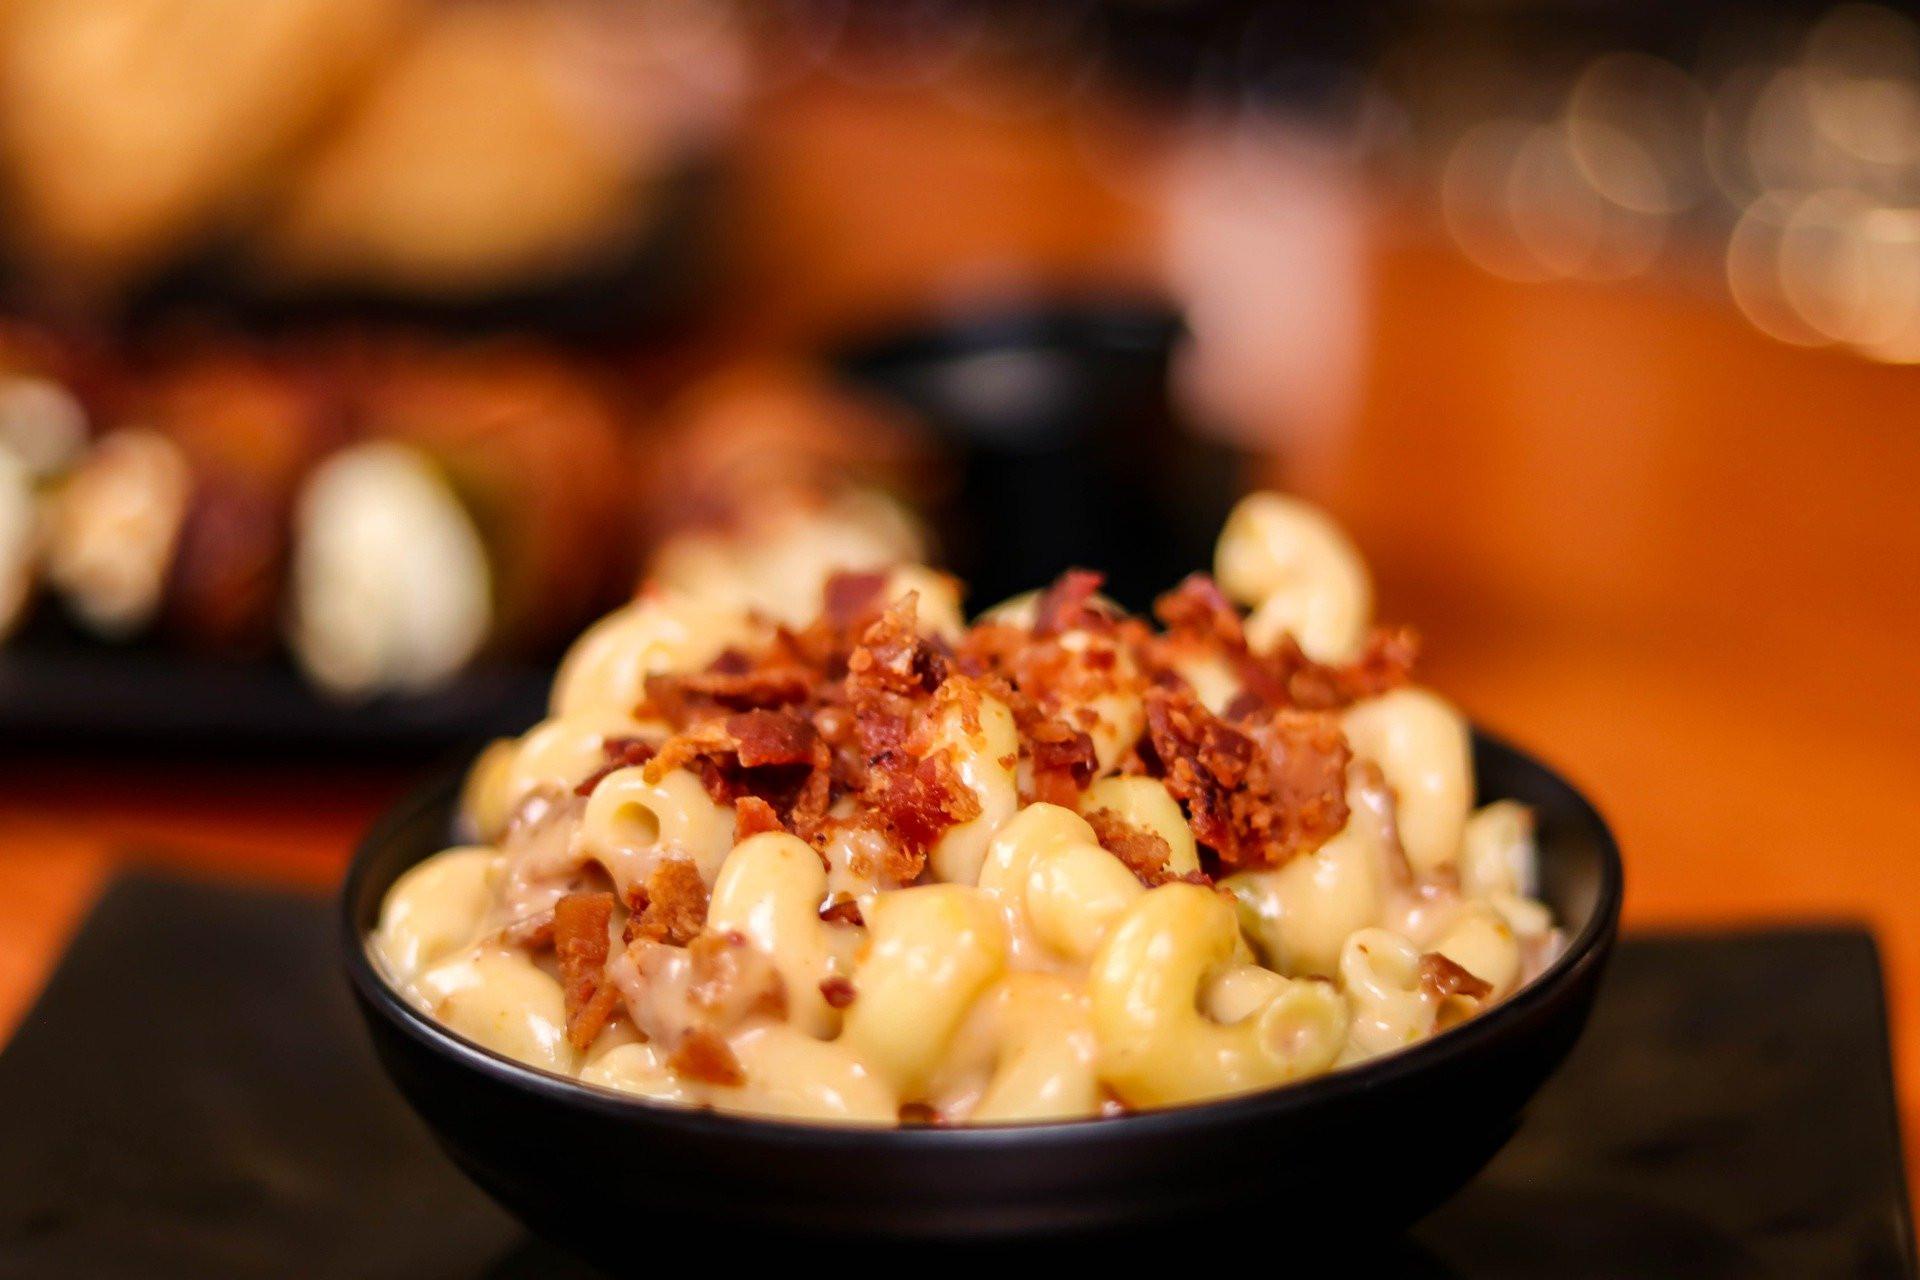 Rosebud's Macaroni & Cheese